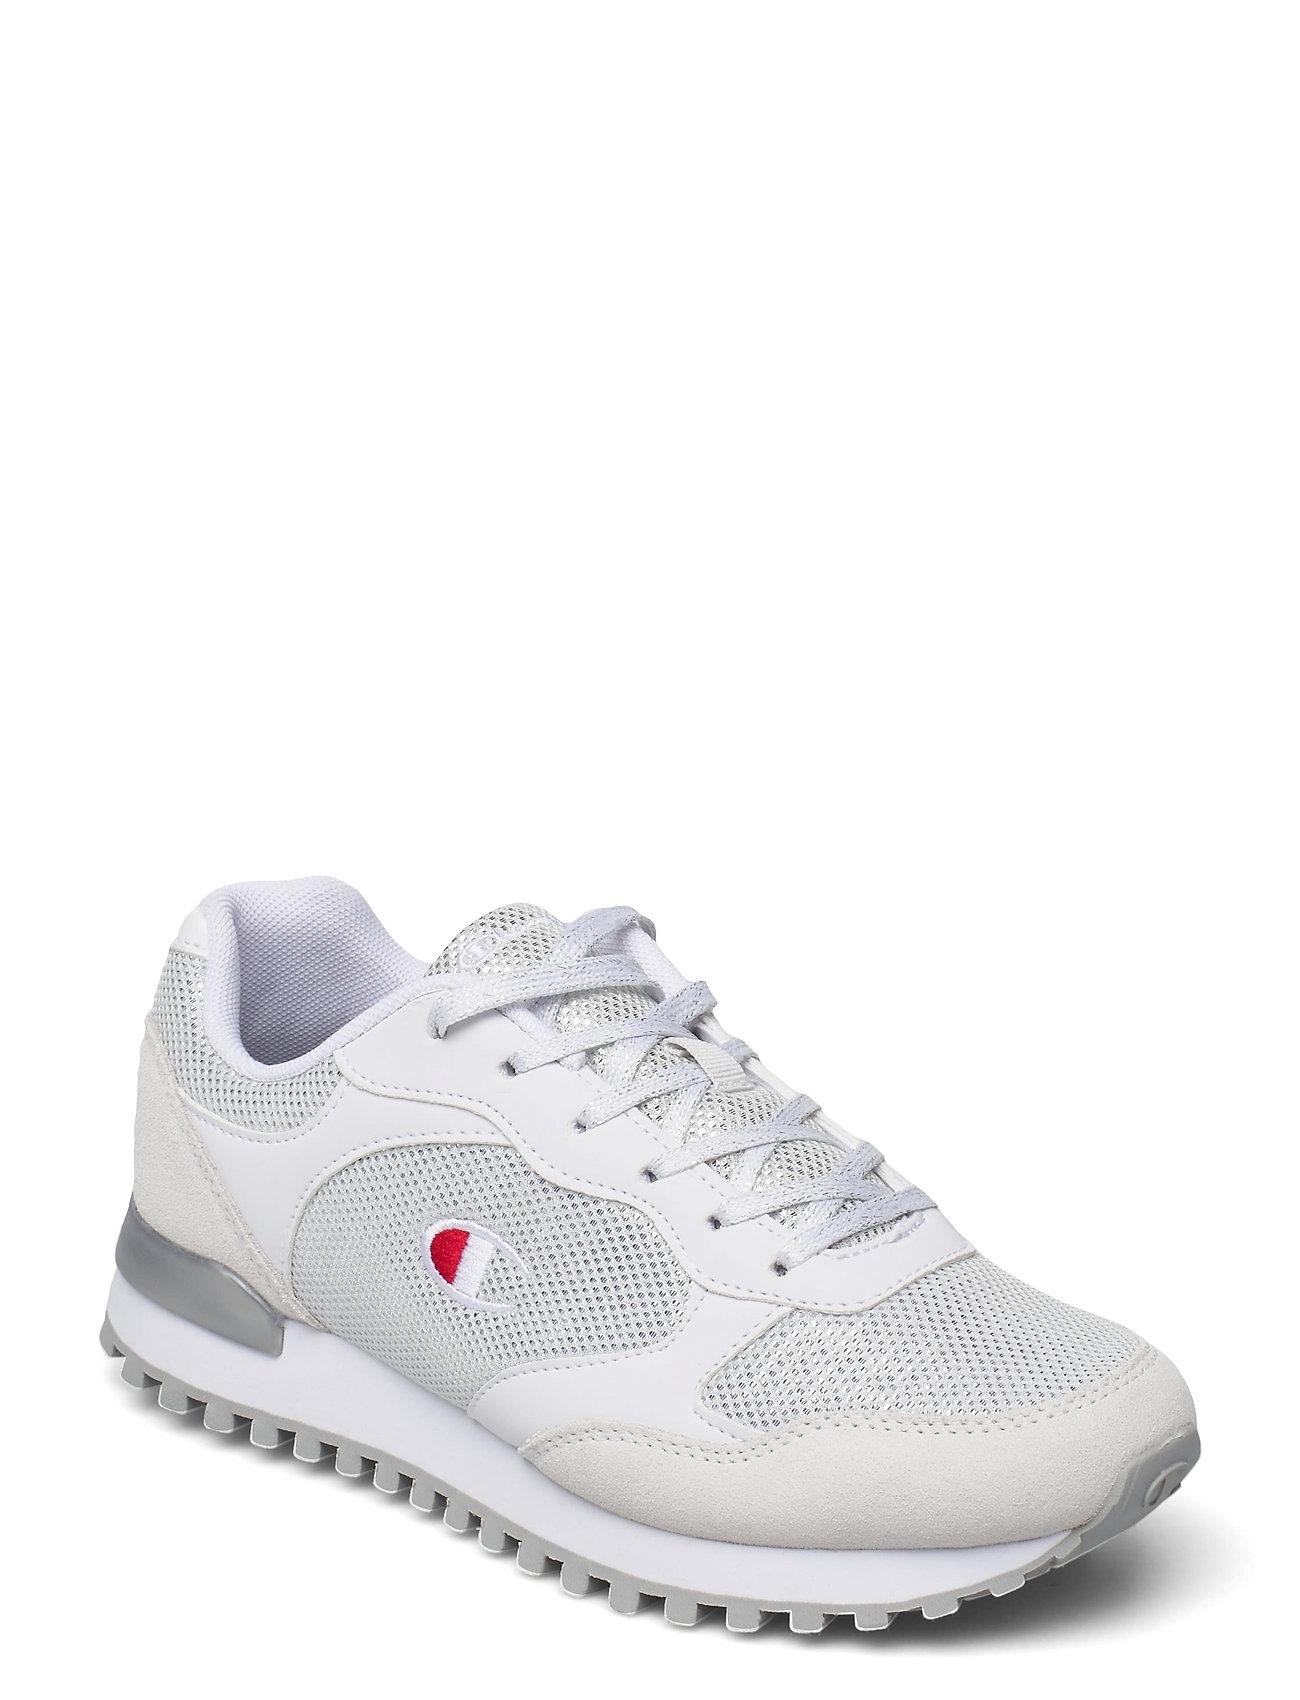 Image of Low Cut Shoe Dsm Femme Low-top Sneakers Hvid Champion (3513210369)